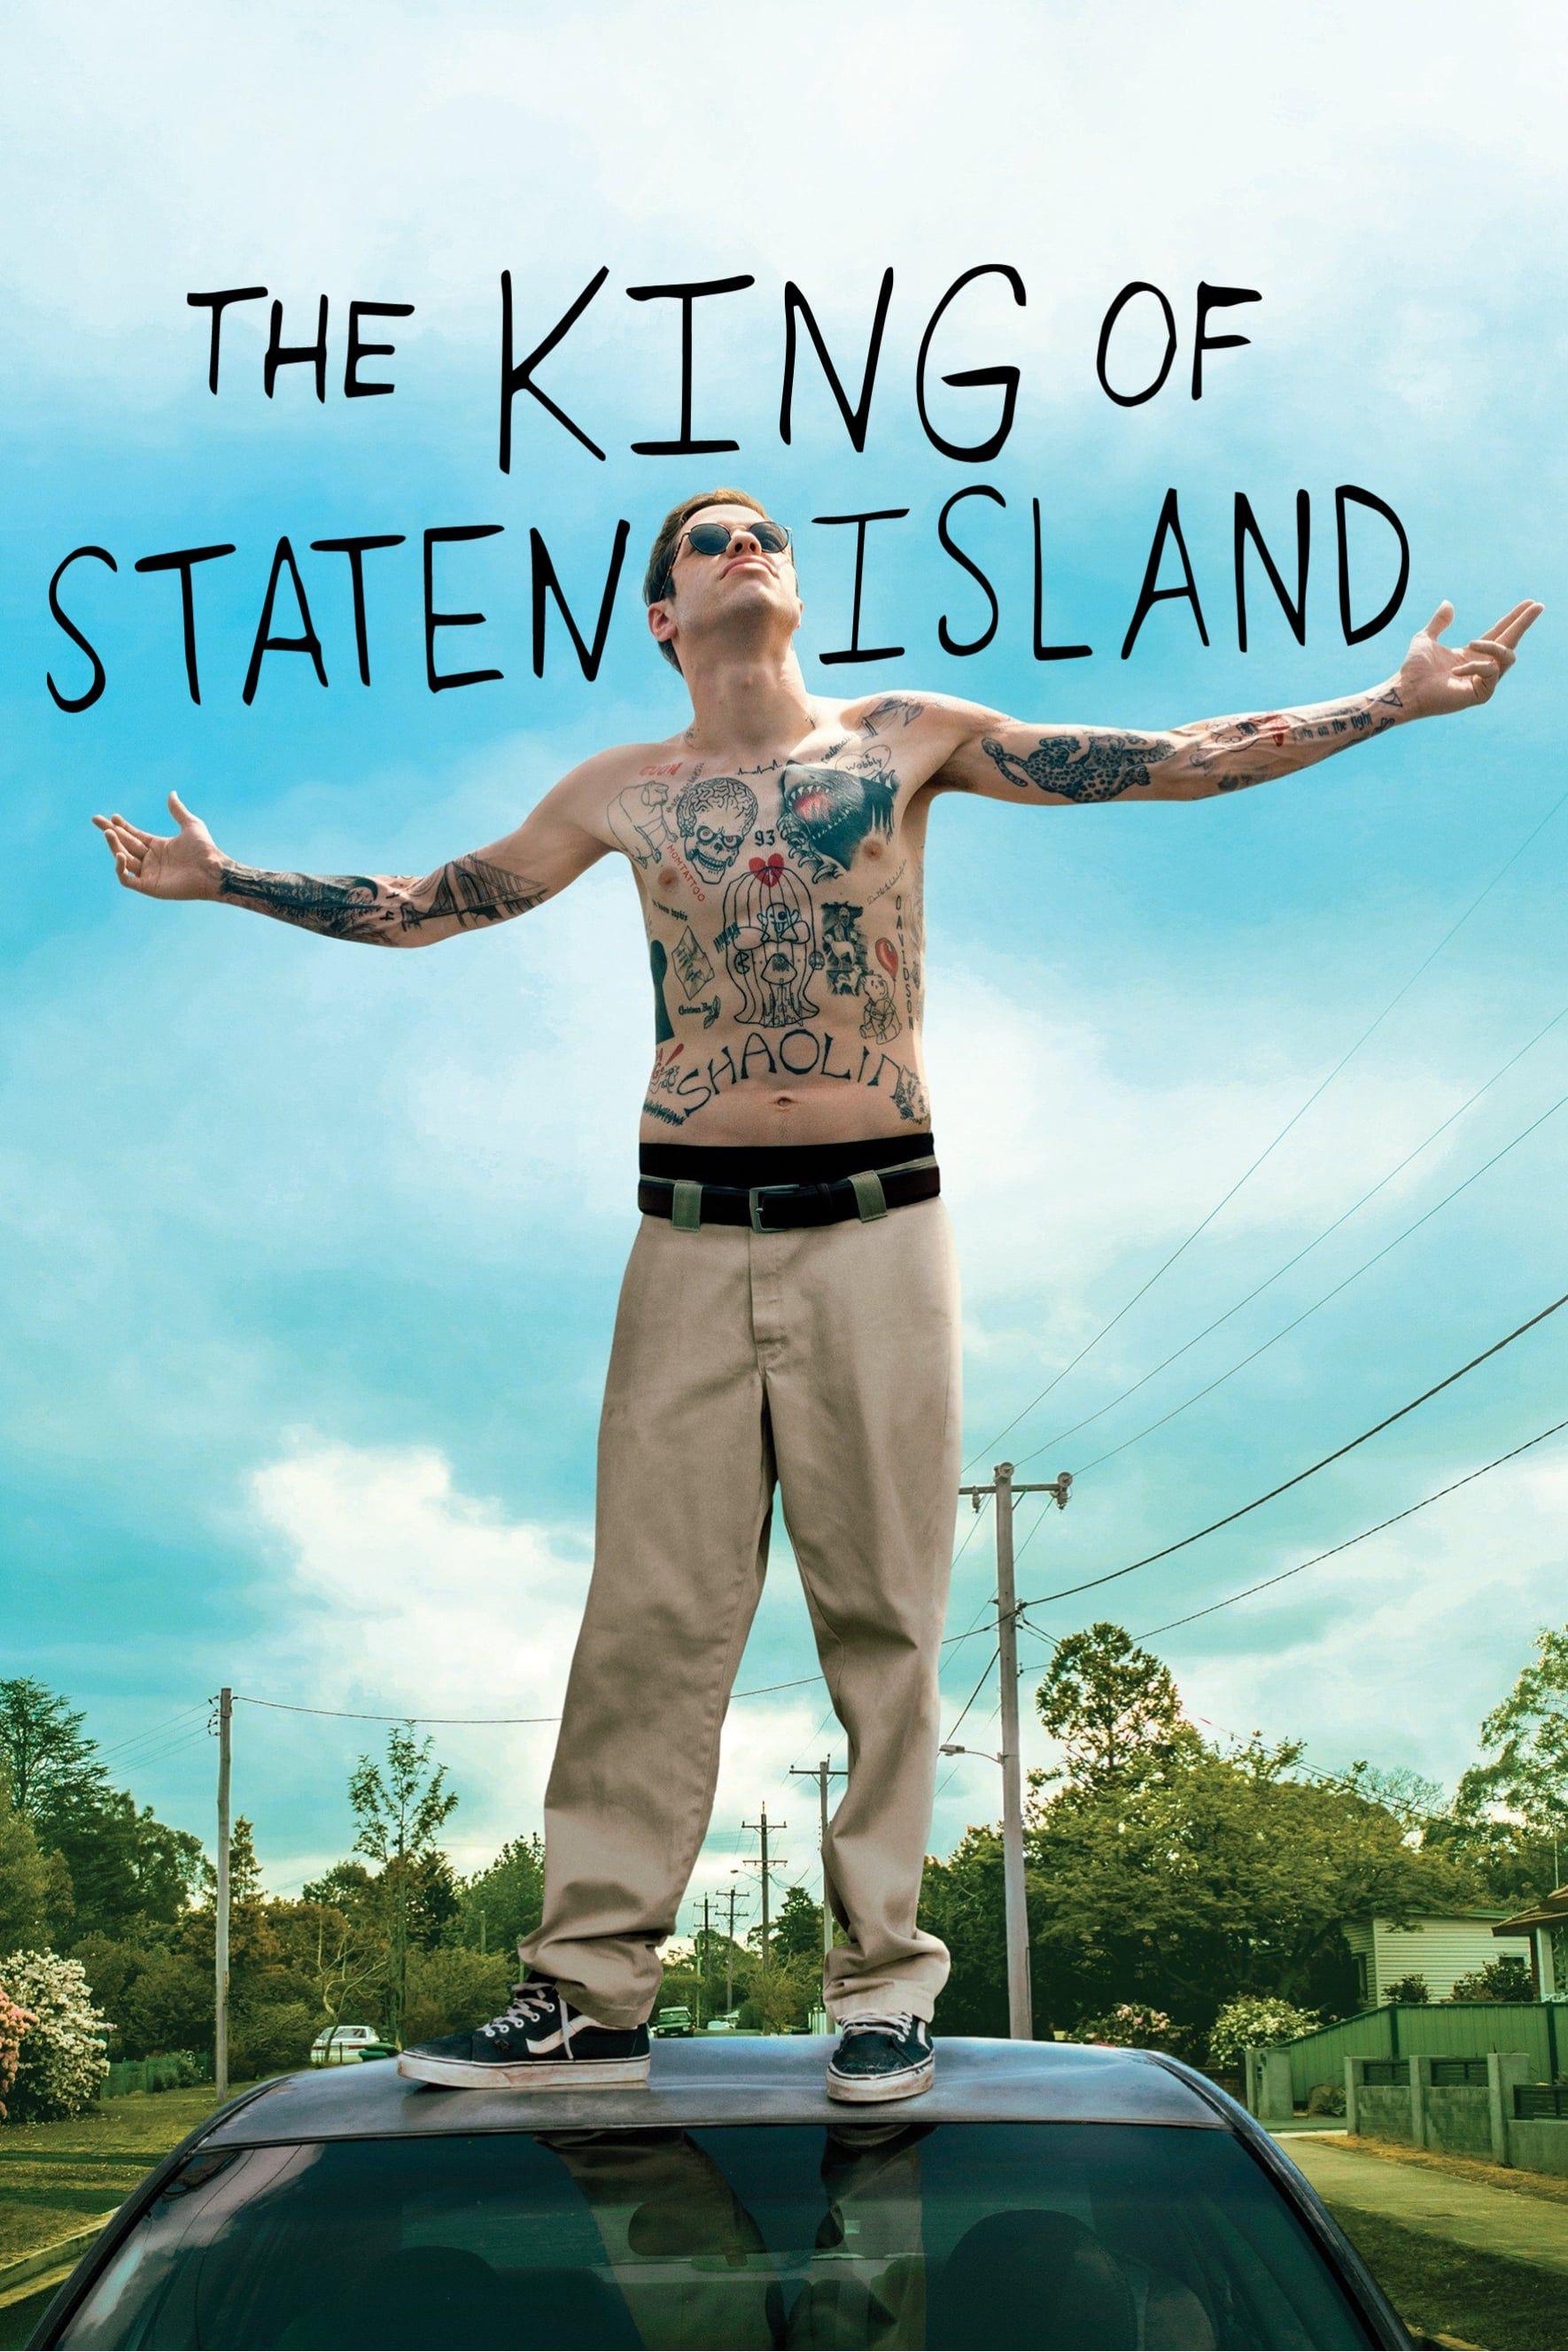 The King Of Staten Island Magyar Szinkron Hungary Magyarul Teljes Thekingofstatenisland Magyar Fi Peliculas Completas Peliculas Ver Peliculas Completas